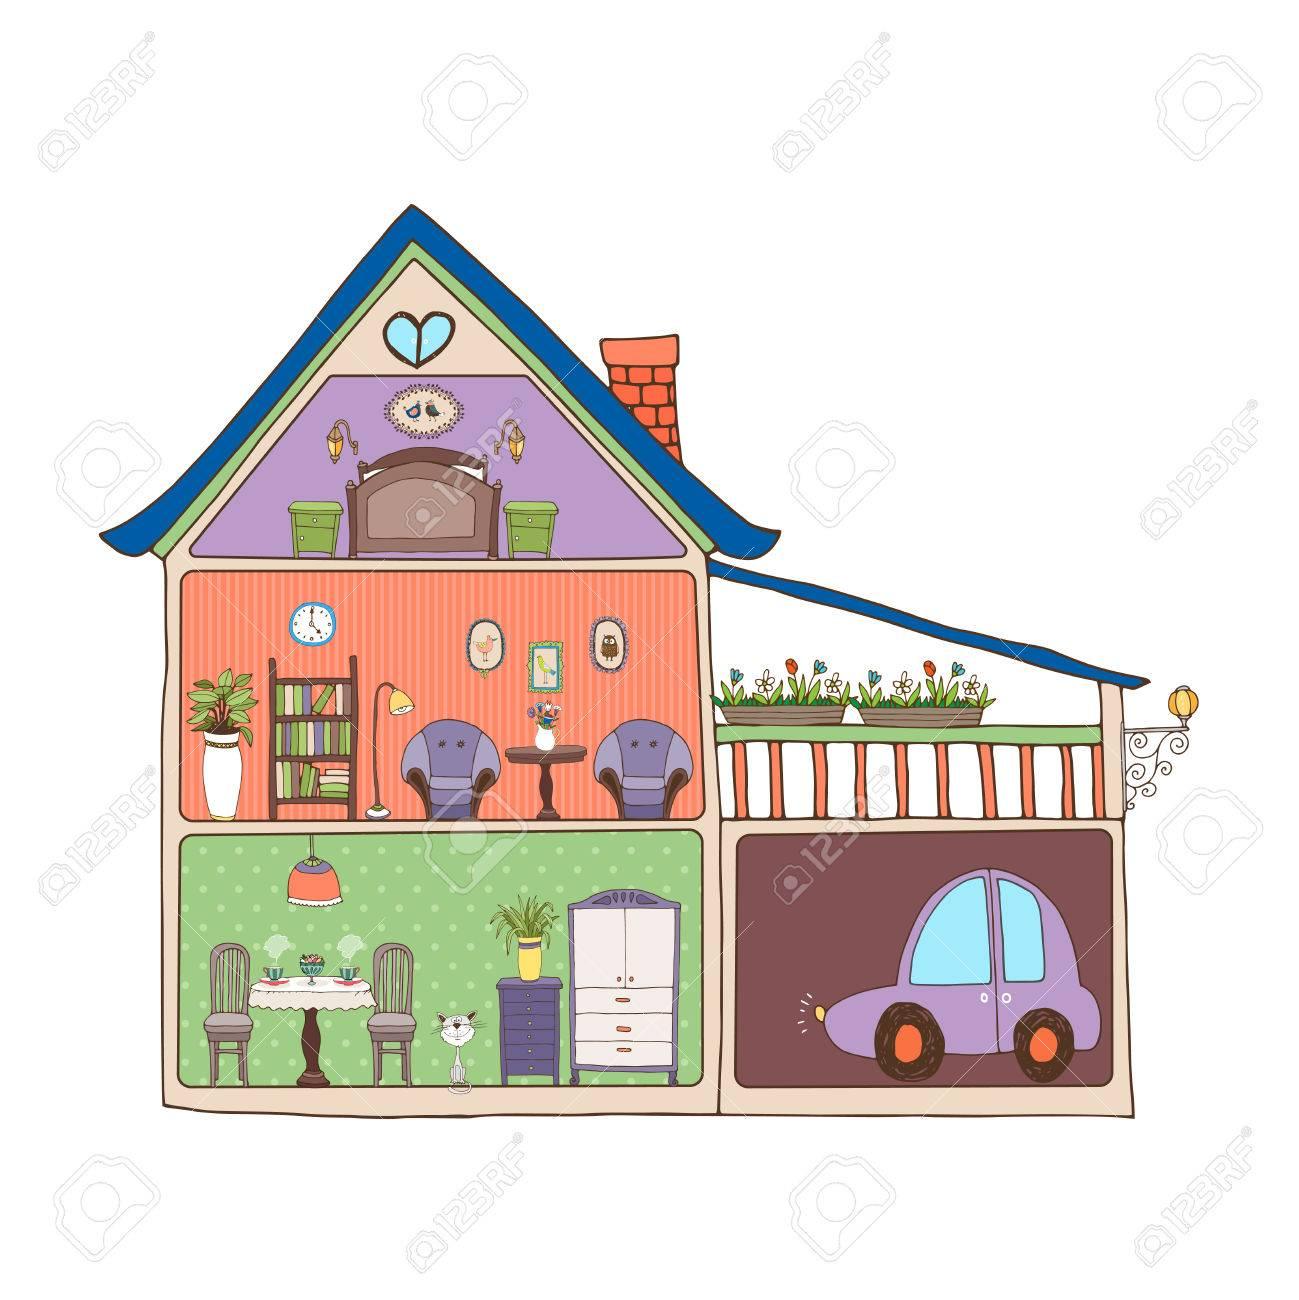 Home Interior Design And Decor